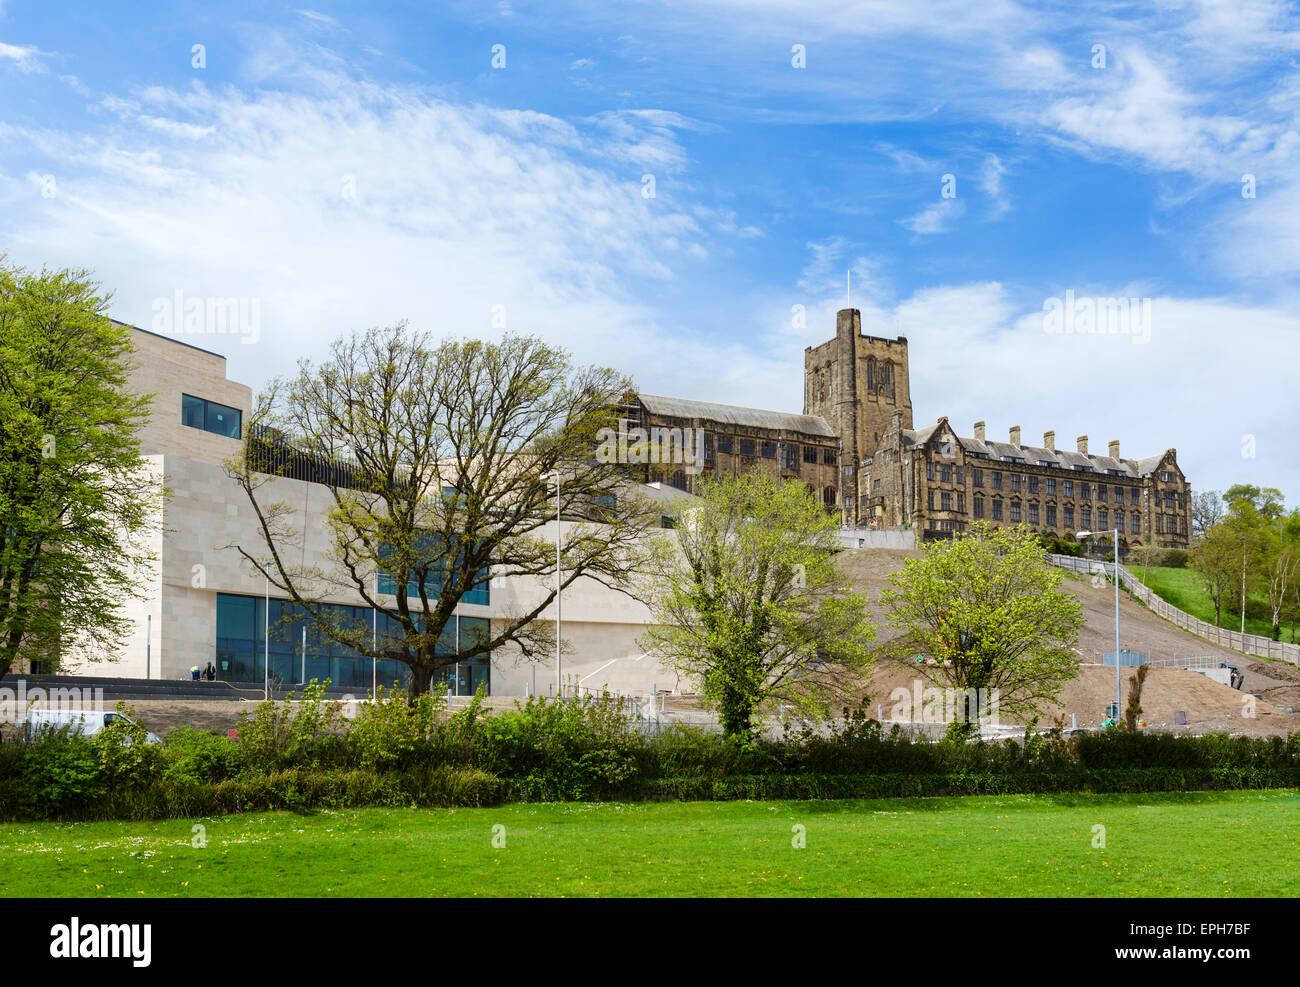 Bangor University, Bangor, Gwynedd, Wales, UK - Stock Image